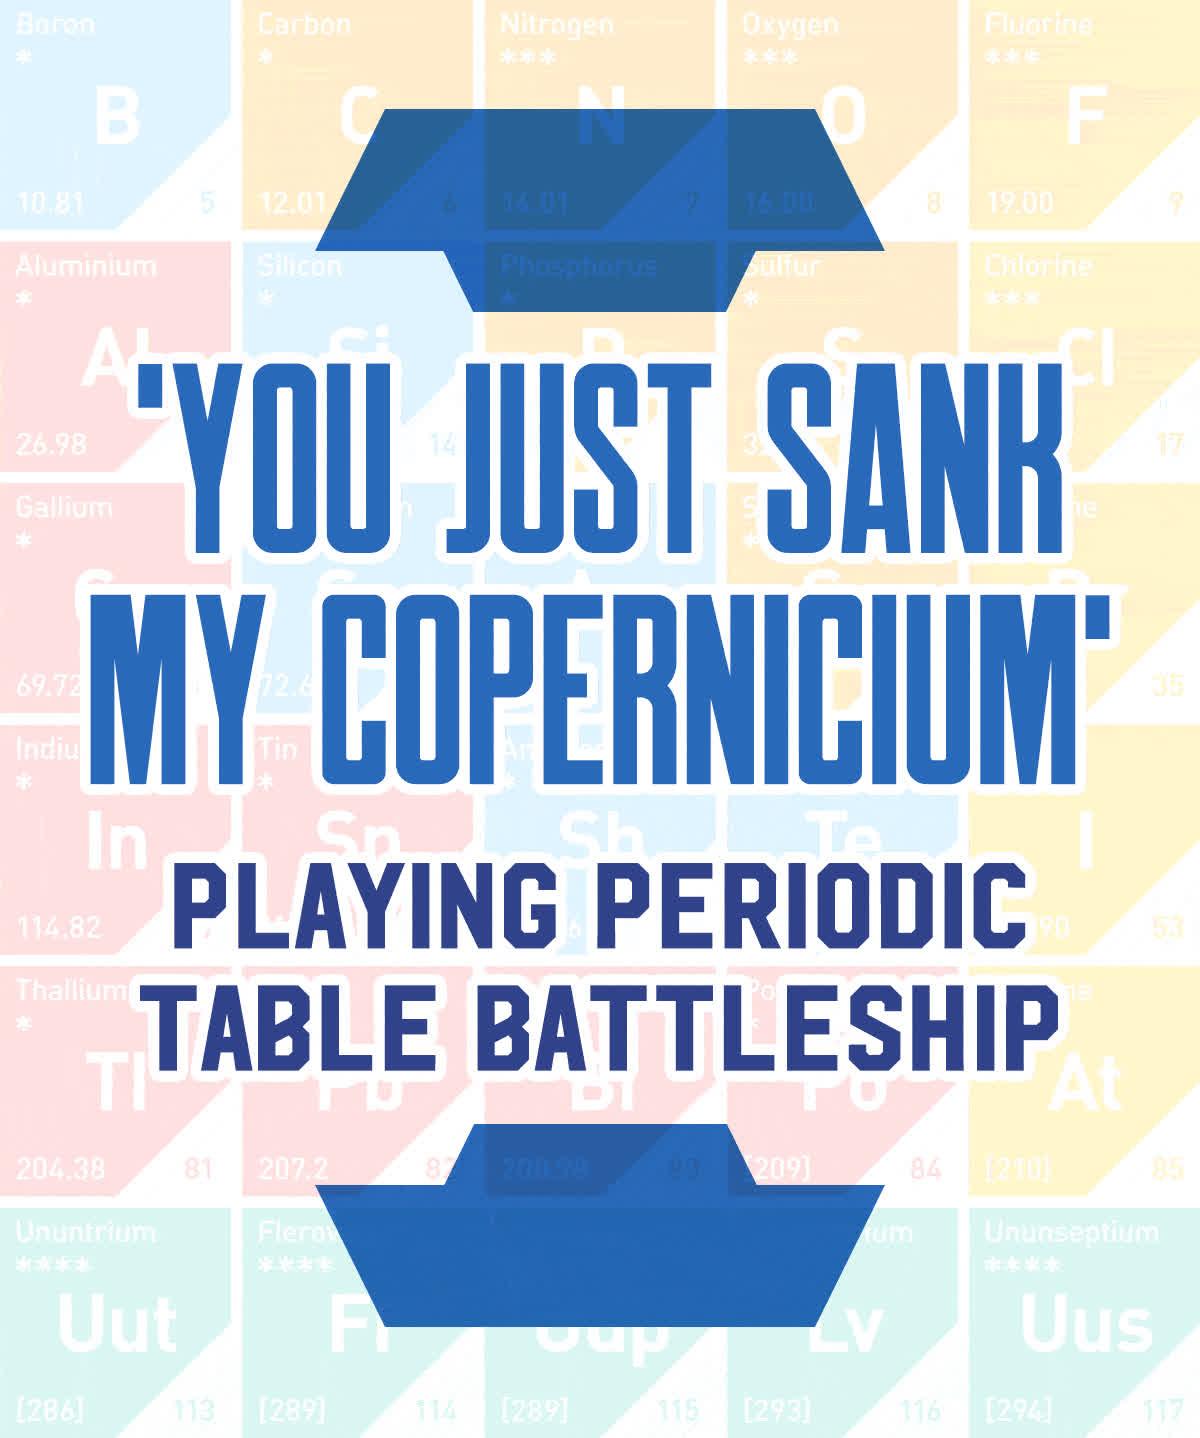 You just sunk my copernicium playing periodic table battleship playing periodic table battleship find make share gfycat gifs urtaz Choice Image